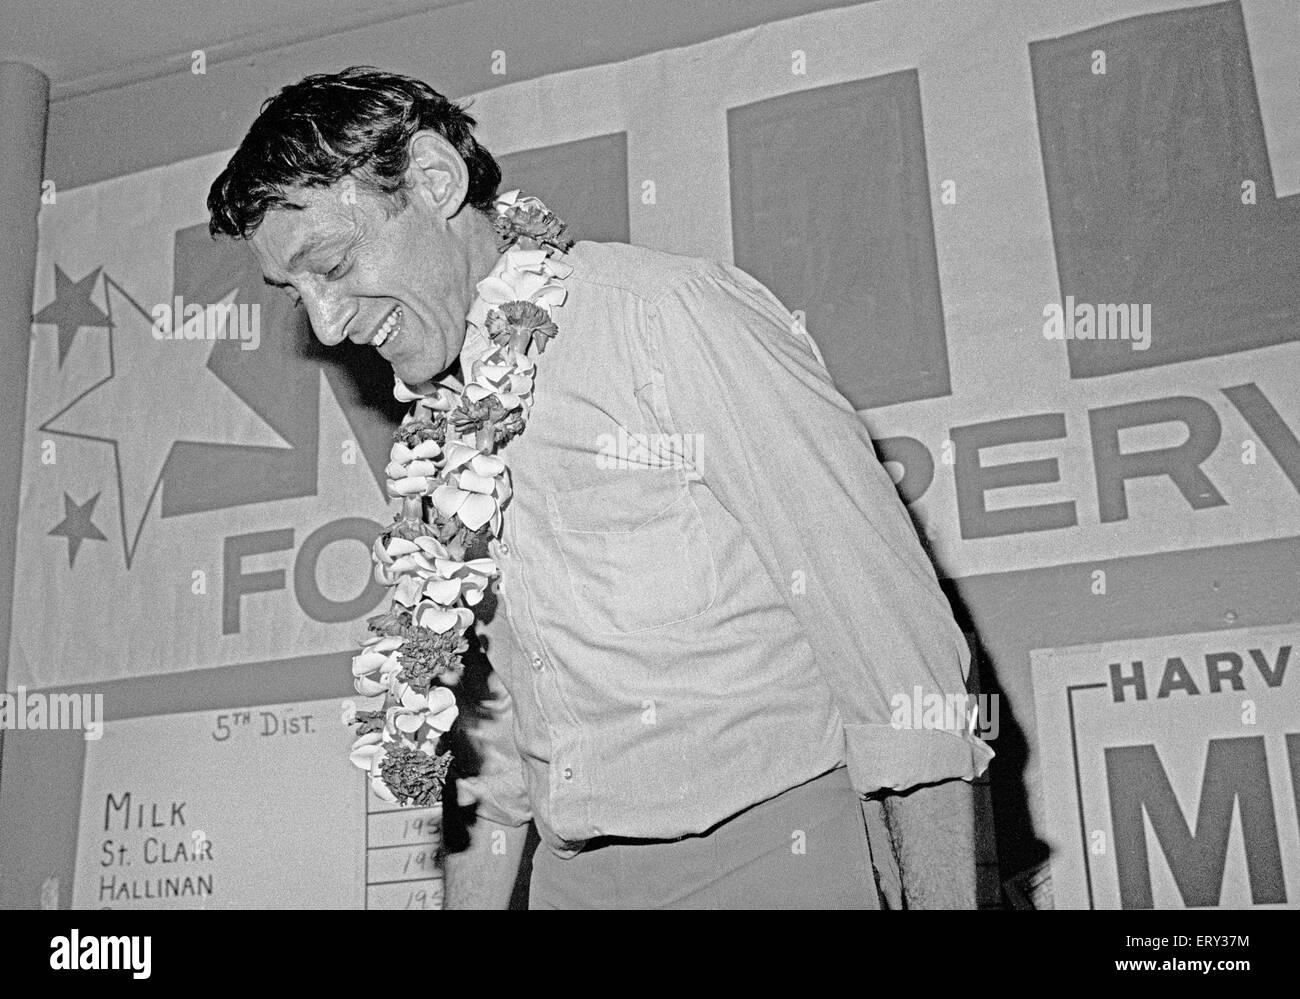 Harvey Milk, wins election as a San Francisco Supervisor, November 8 1977, - Stock Image